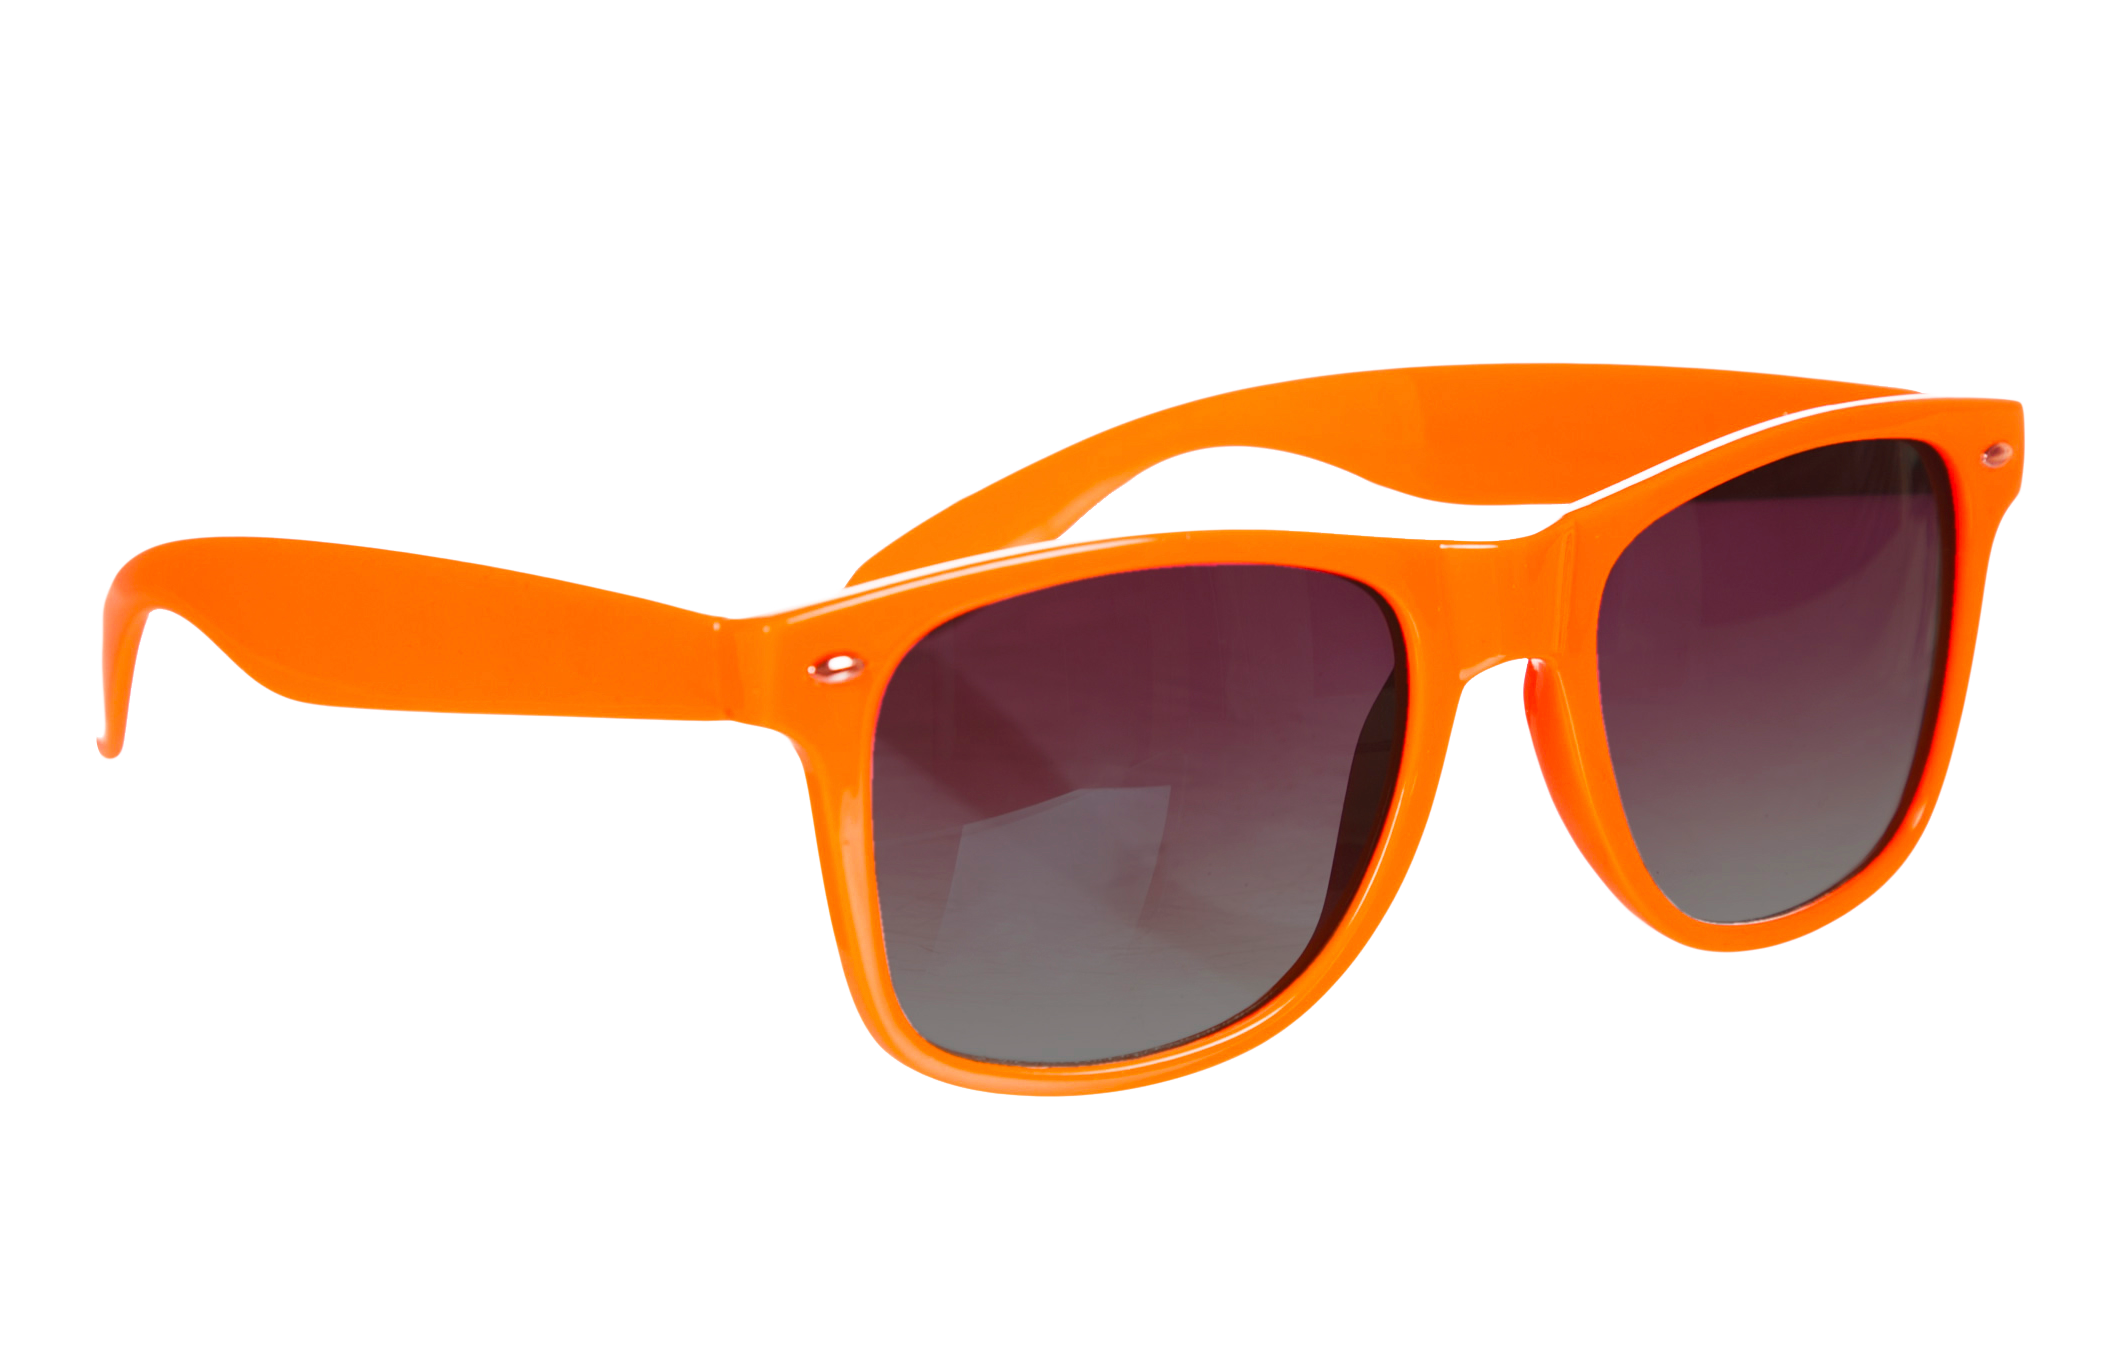 Sunglass png image purepng. Sunglasses clipart transparent background